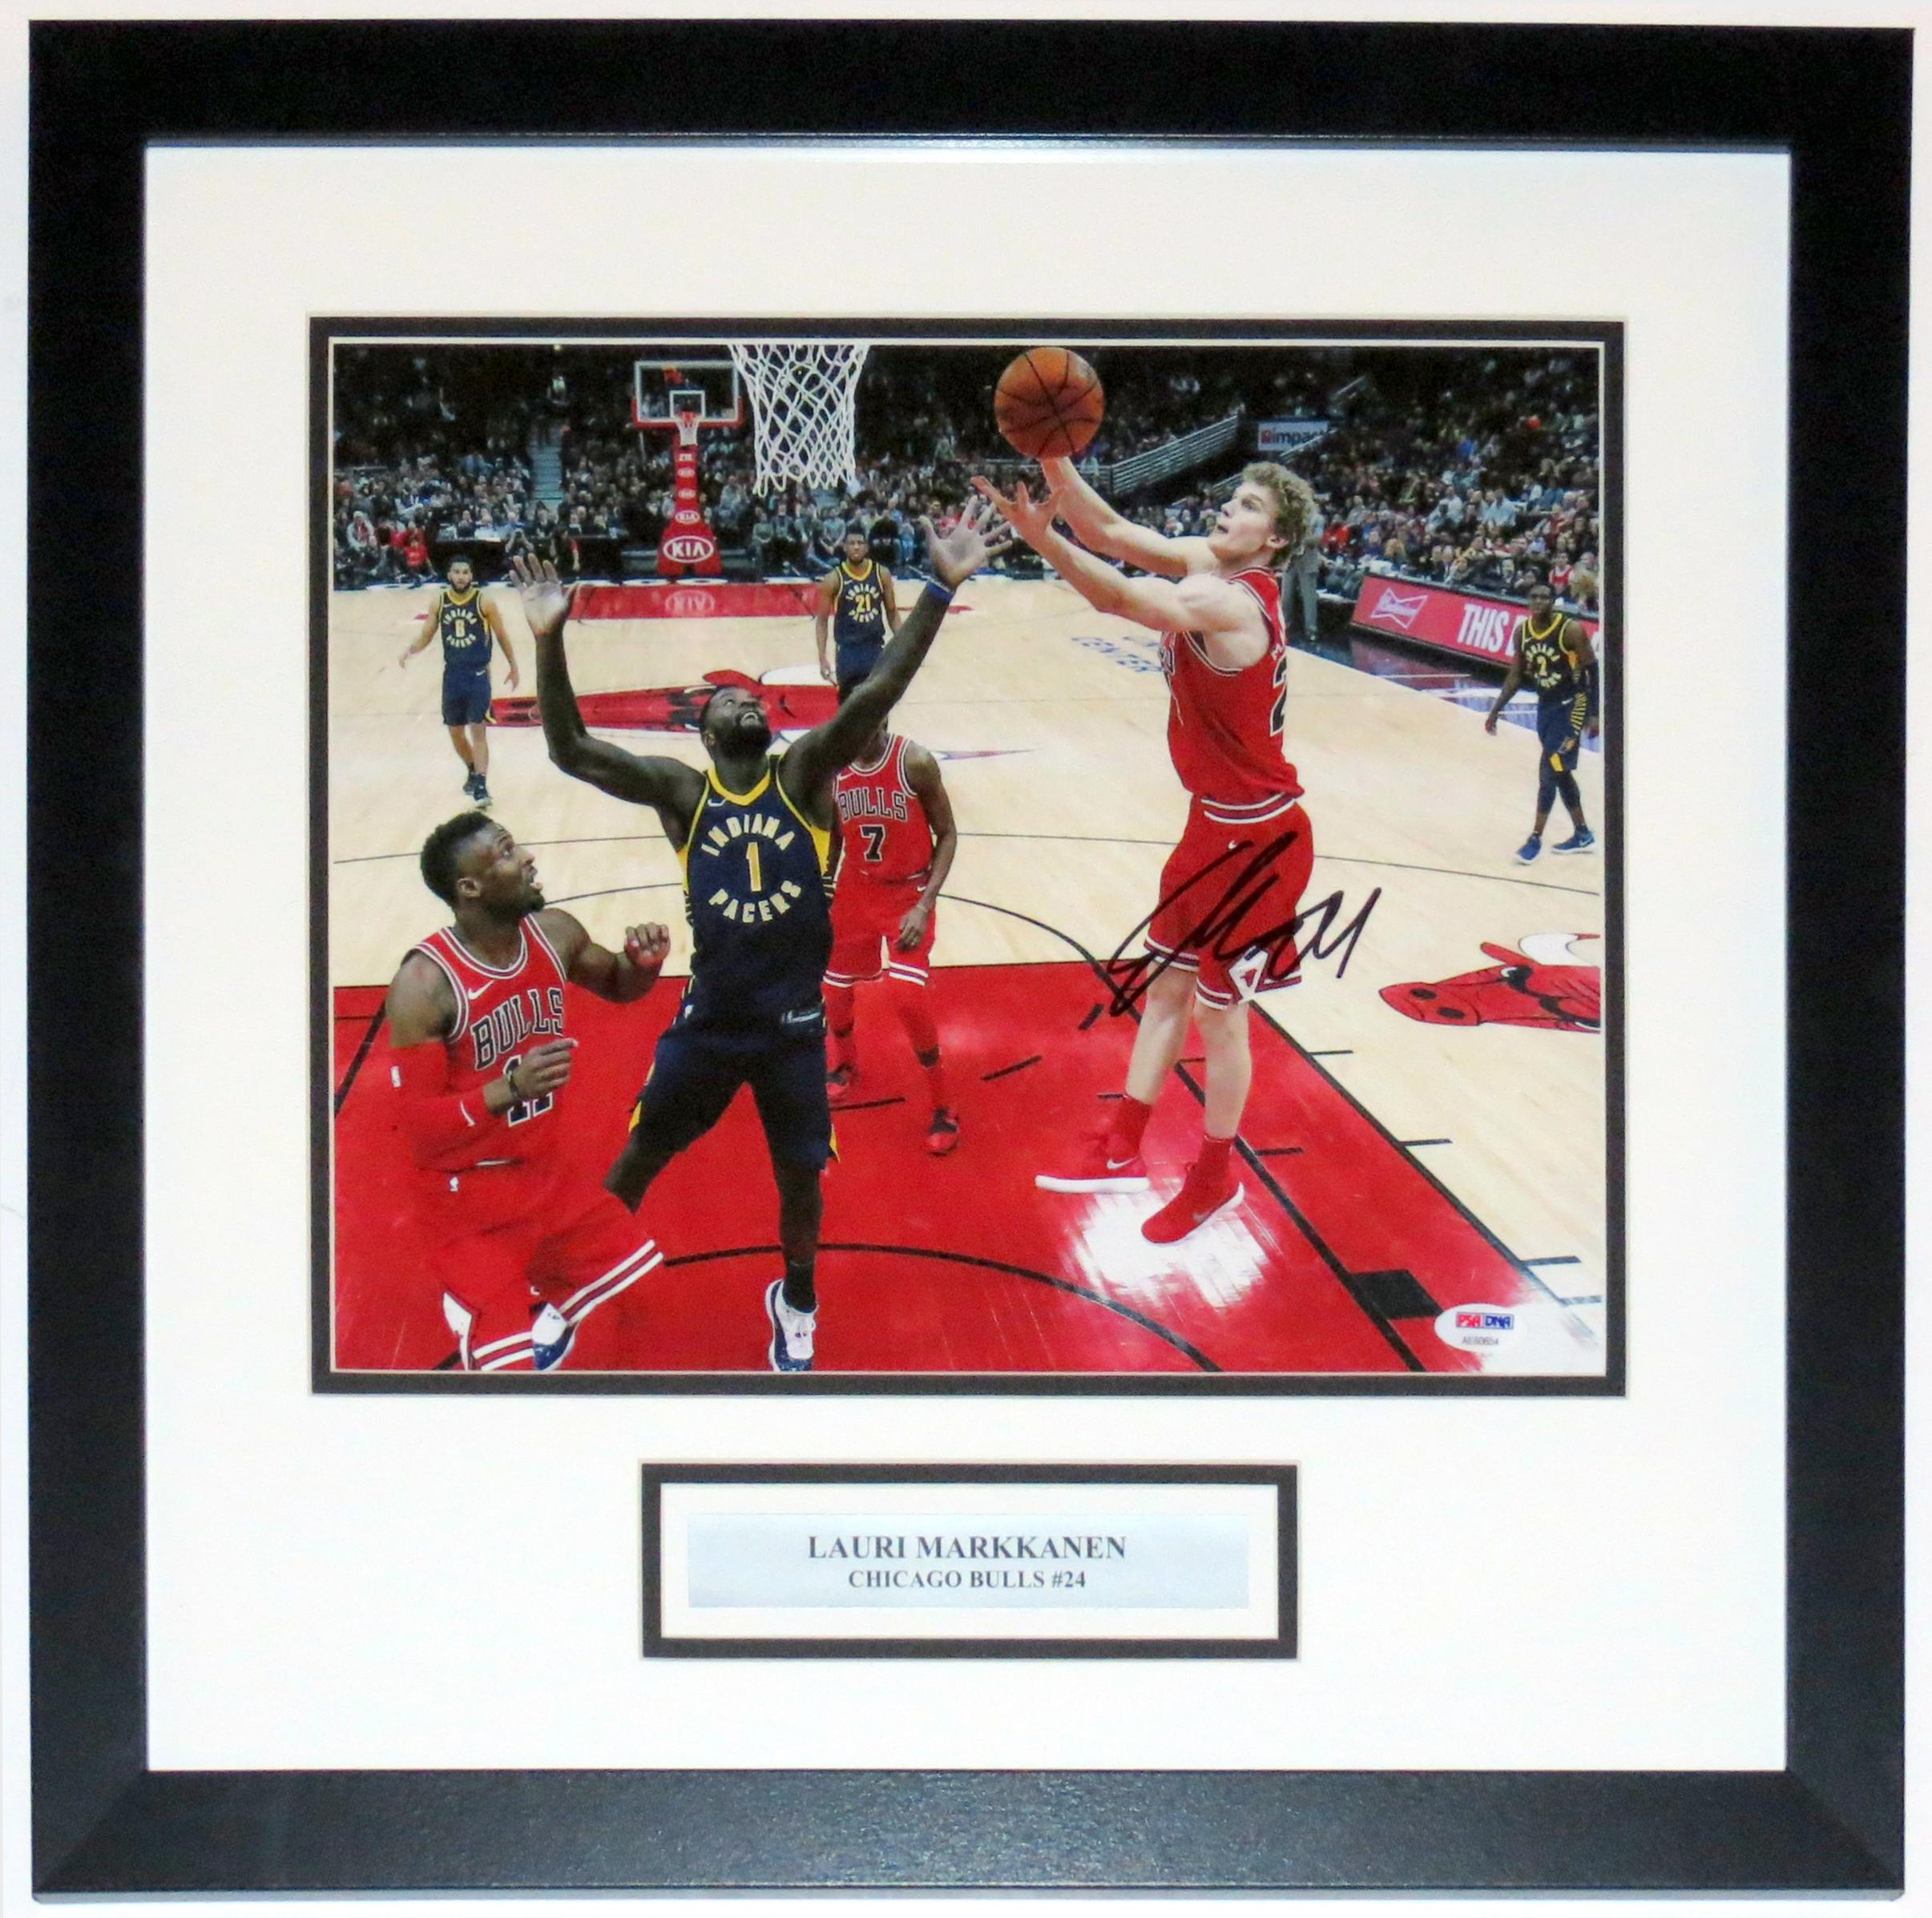 Lauri Markkanen Autographed Chicago Bulls 11x14 Photo - PSA DNA COA Authenticated - Professionally Framed & Plate